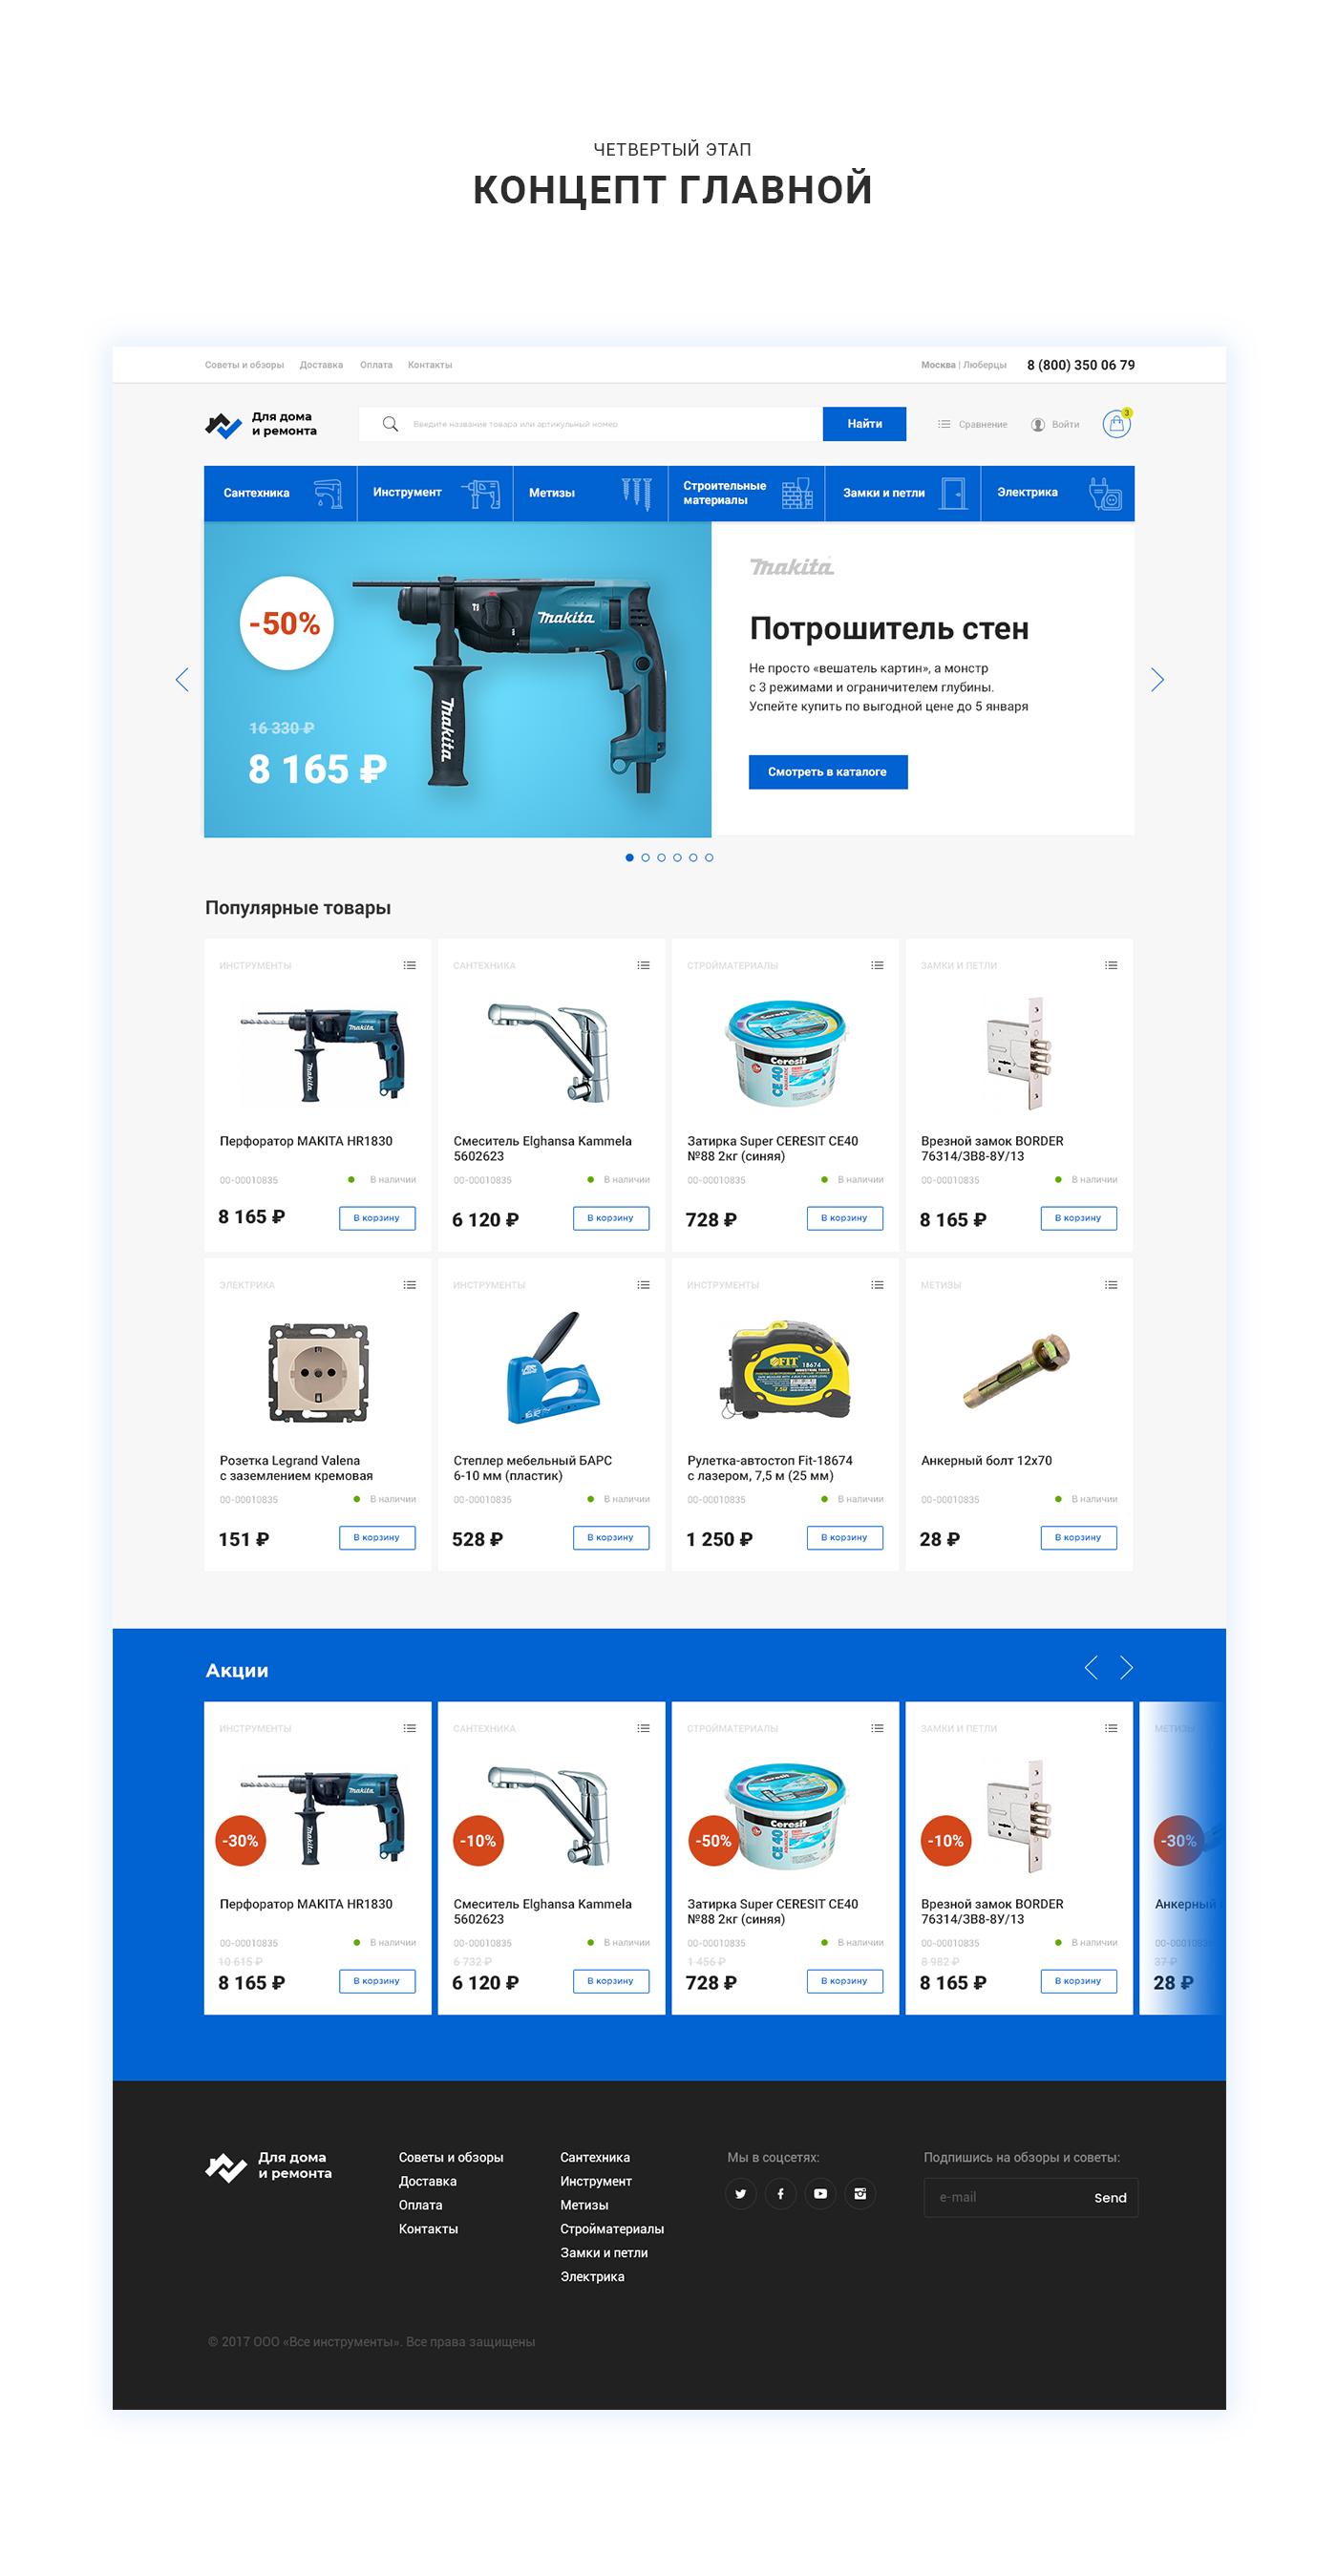 Hardware Store Website Redesign On Behance Website Redesign Hardware Store Landing Page Inspiration